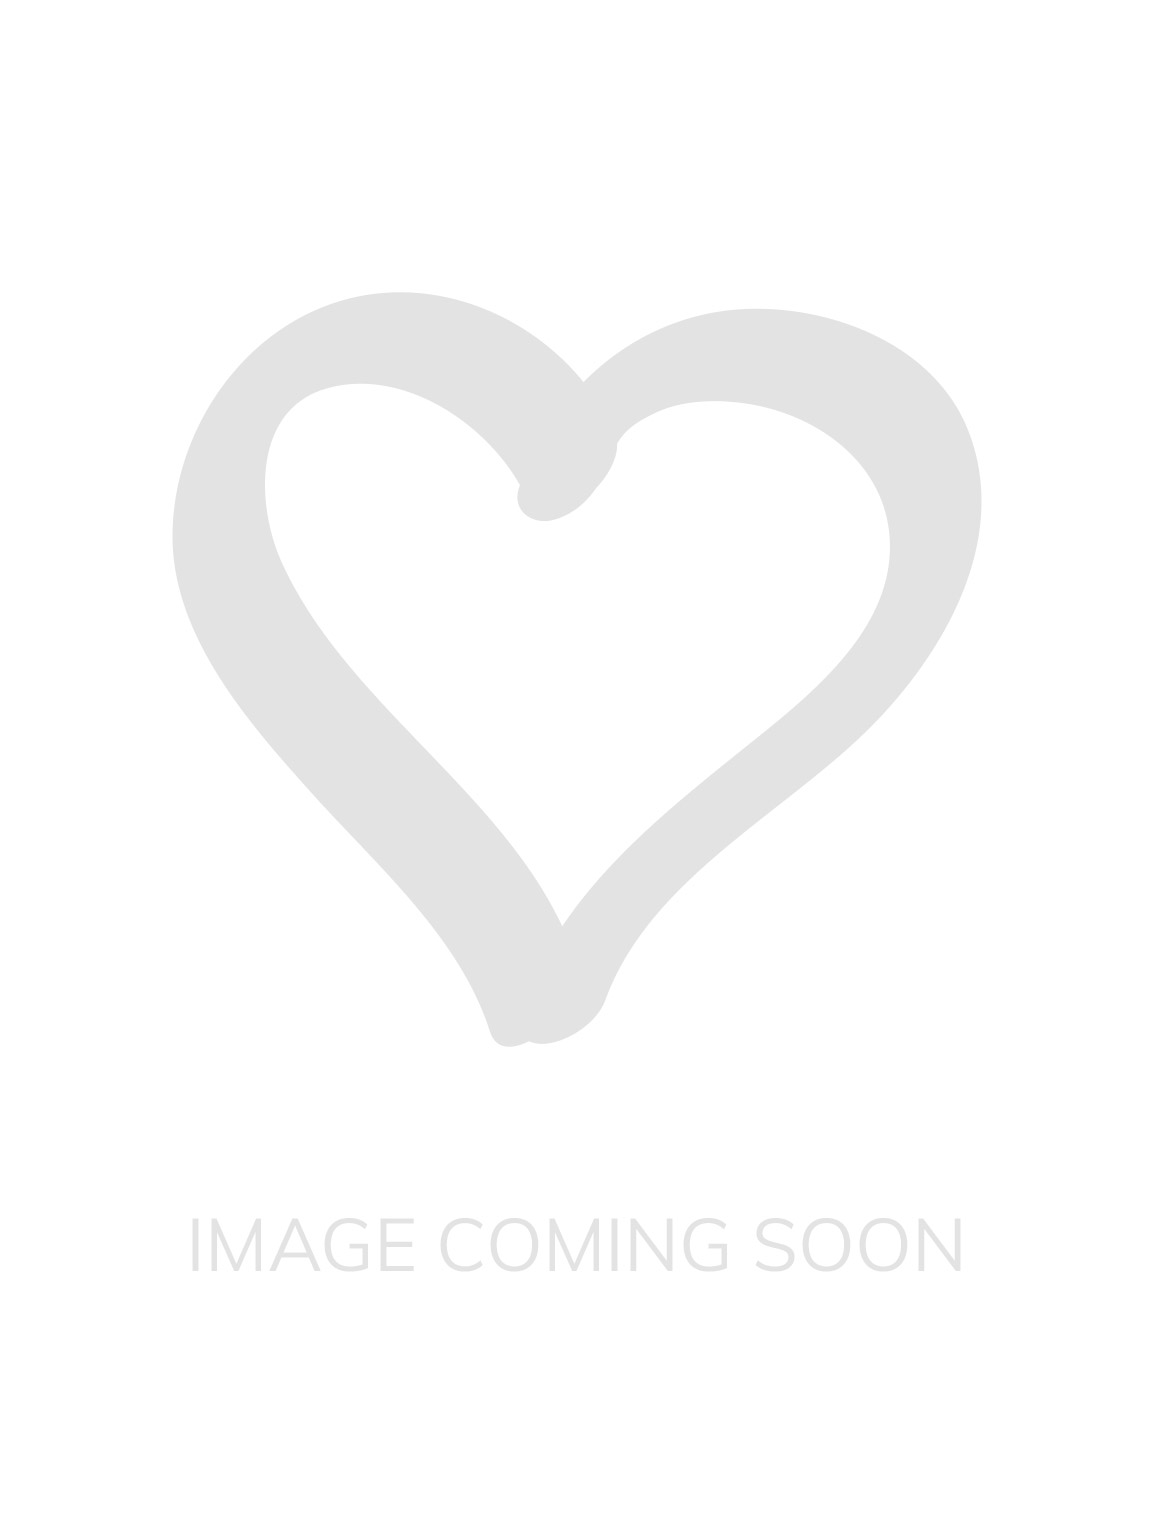 337ae84df Zero Feel Push Up Bralette - Mystic Sea | Lingerie Outlet Store